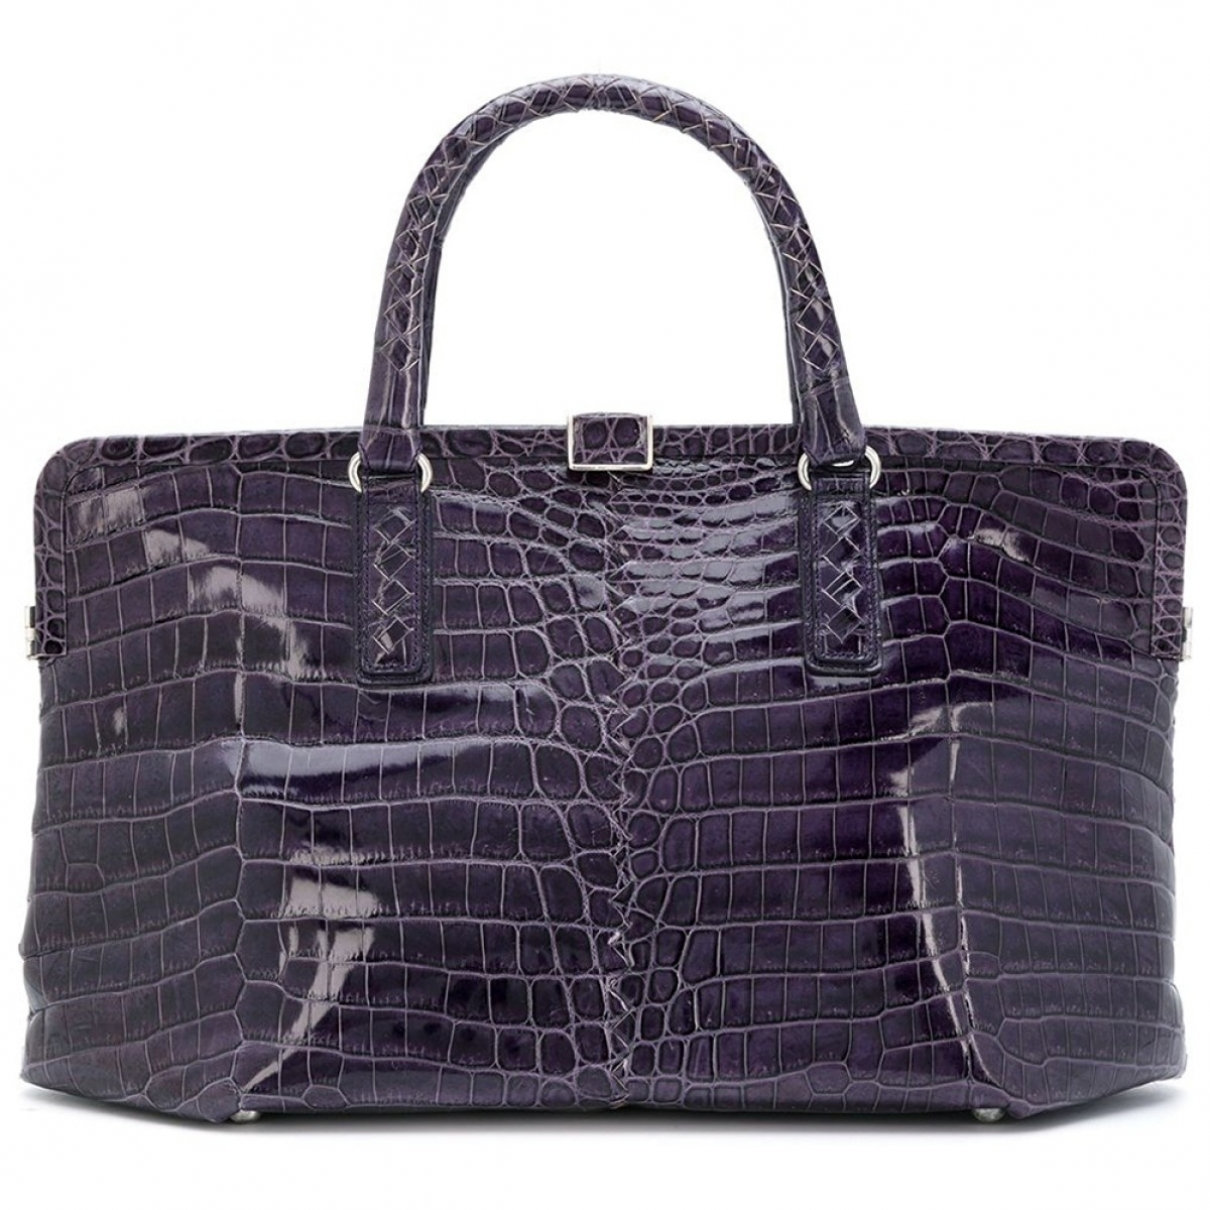 Bottega Veneta \N Purple Crocodile handbag for Women \N